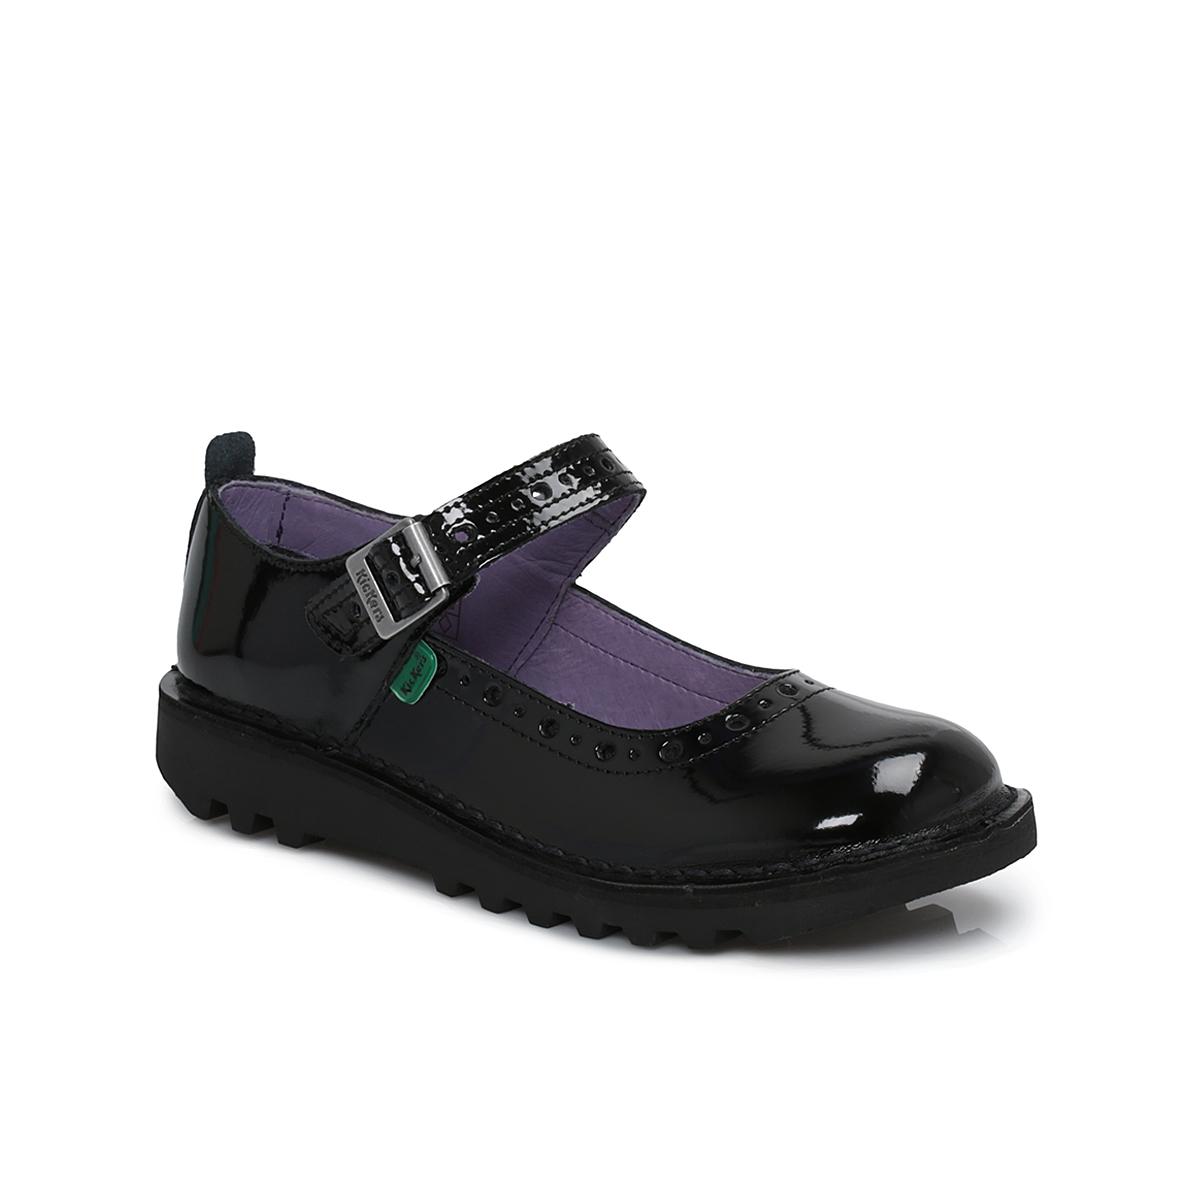 Zapatos KICKERS Cuero Beis T 35 BE